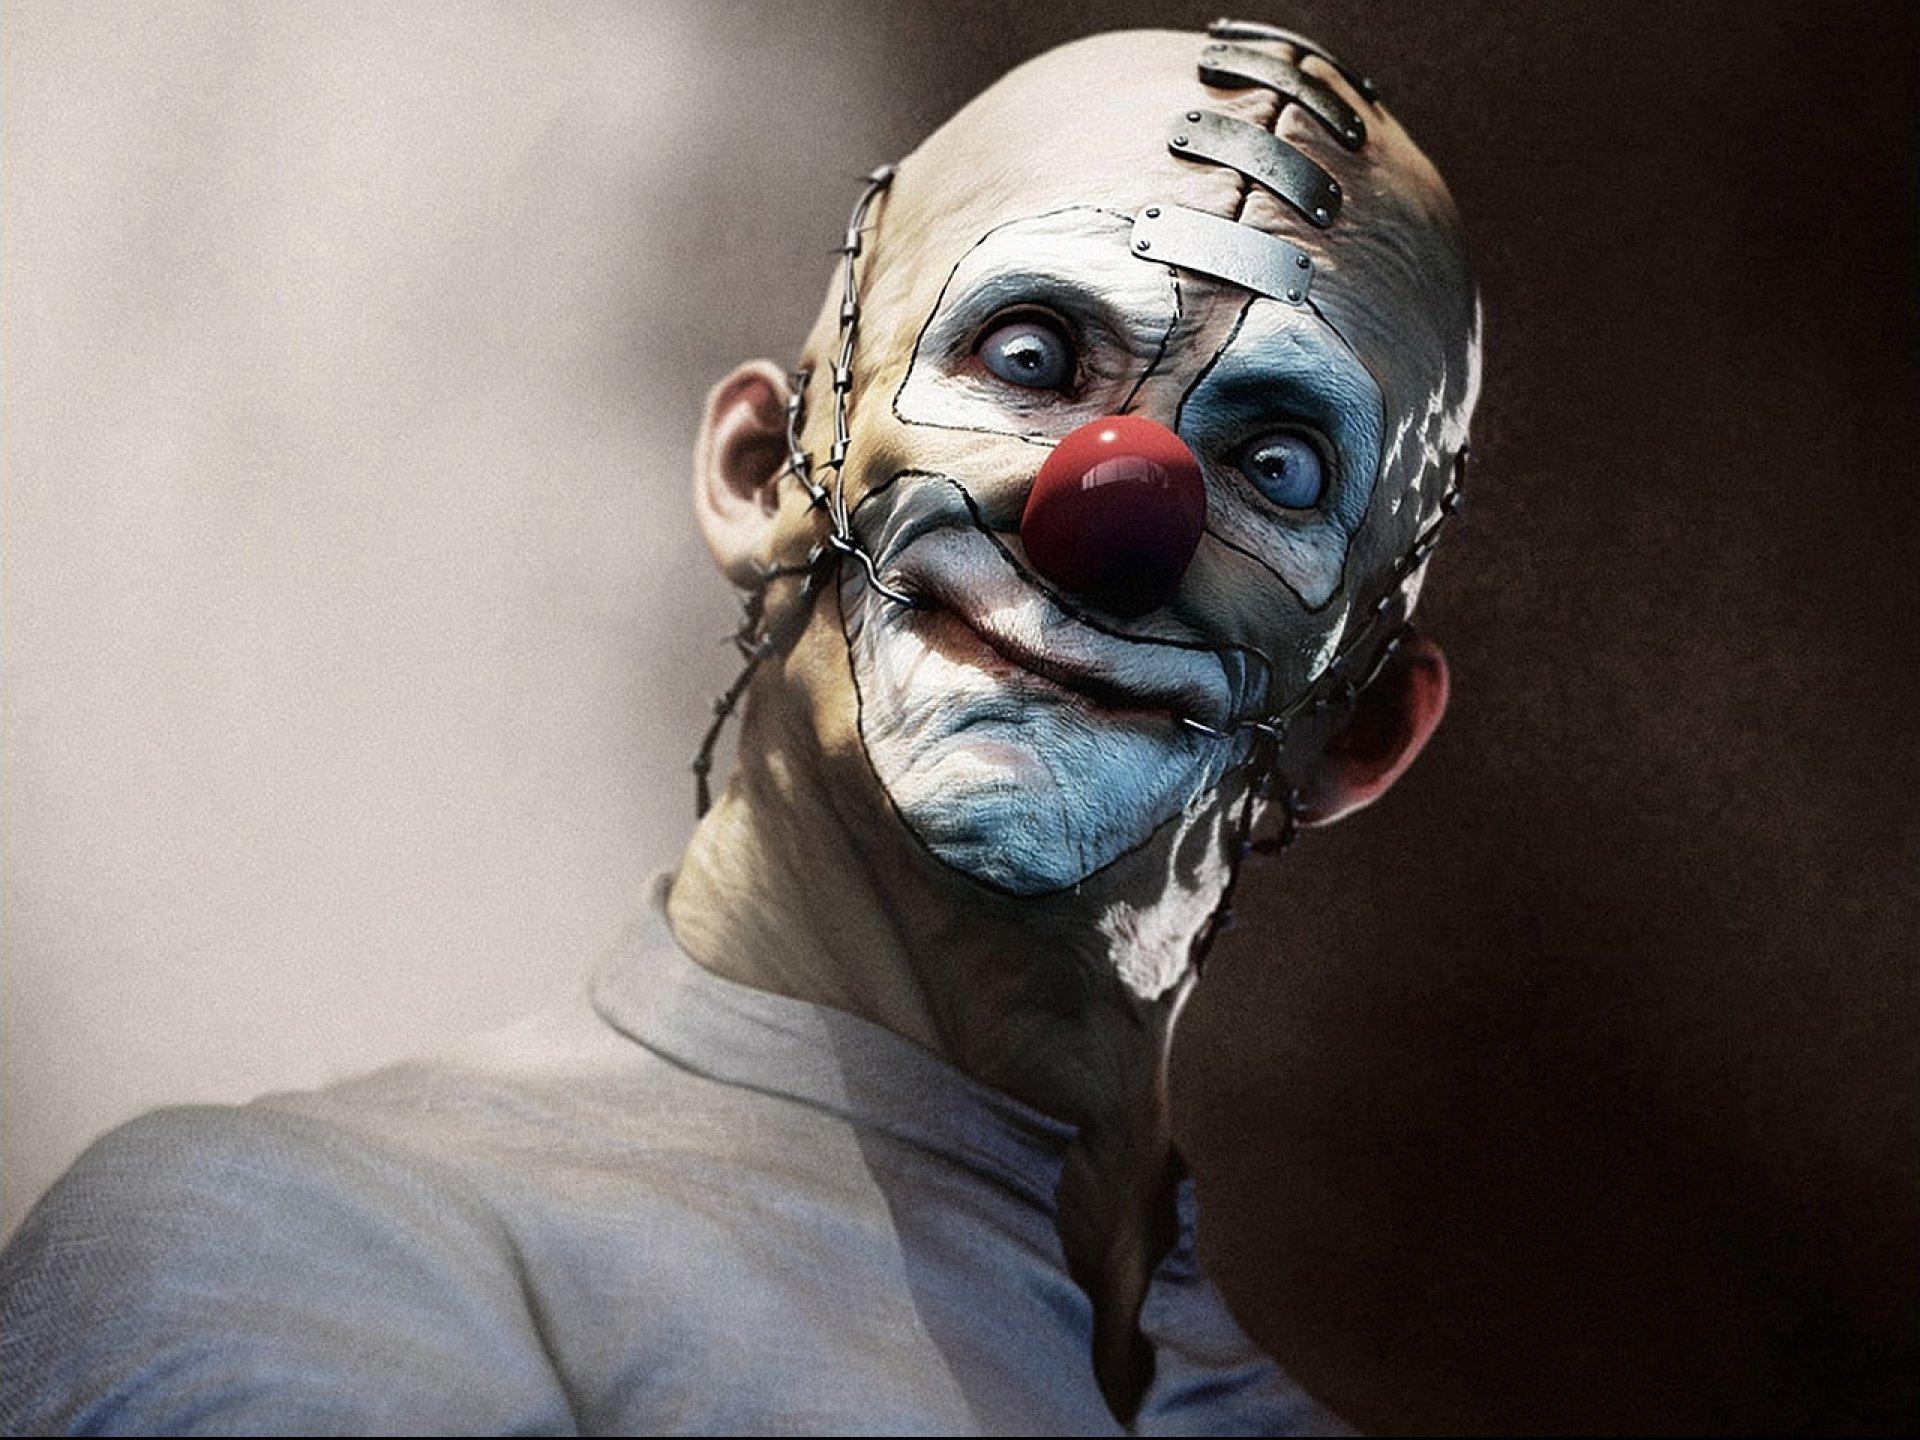 Dark Horror Evil Clown Art Artwork F Wallpaper  1920x1440